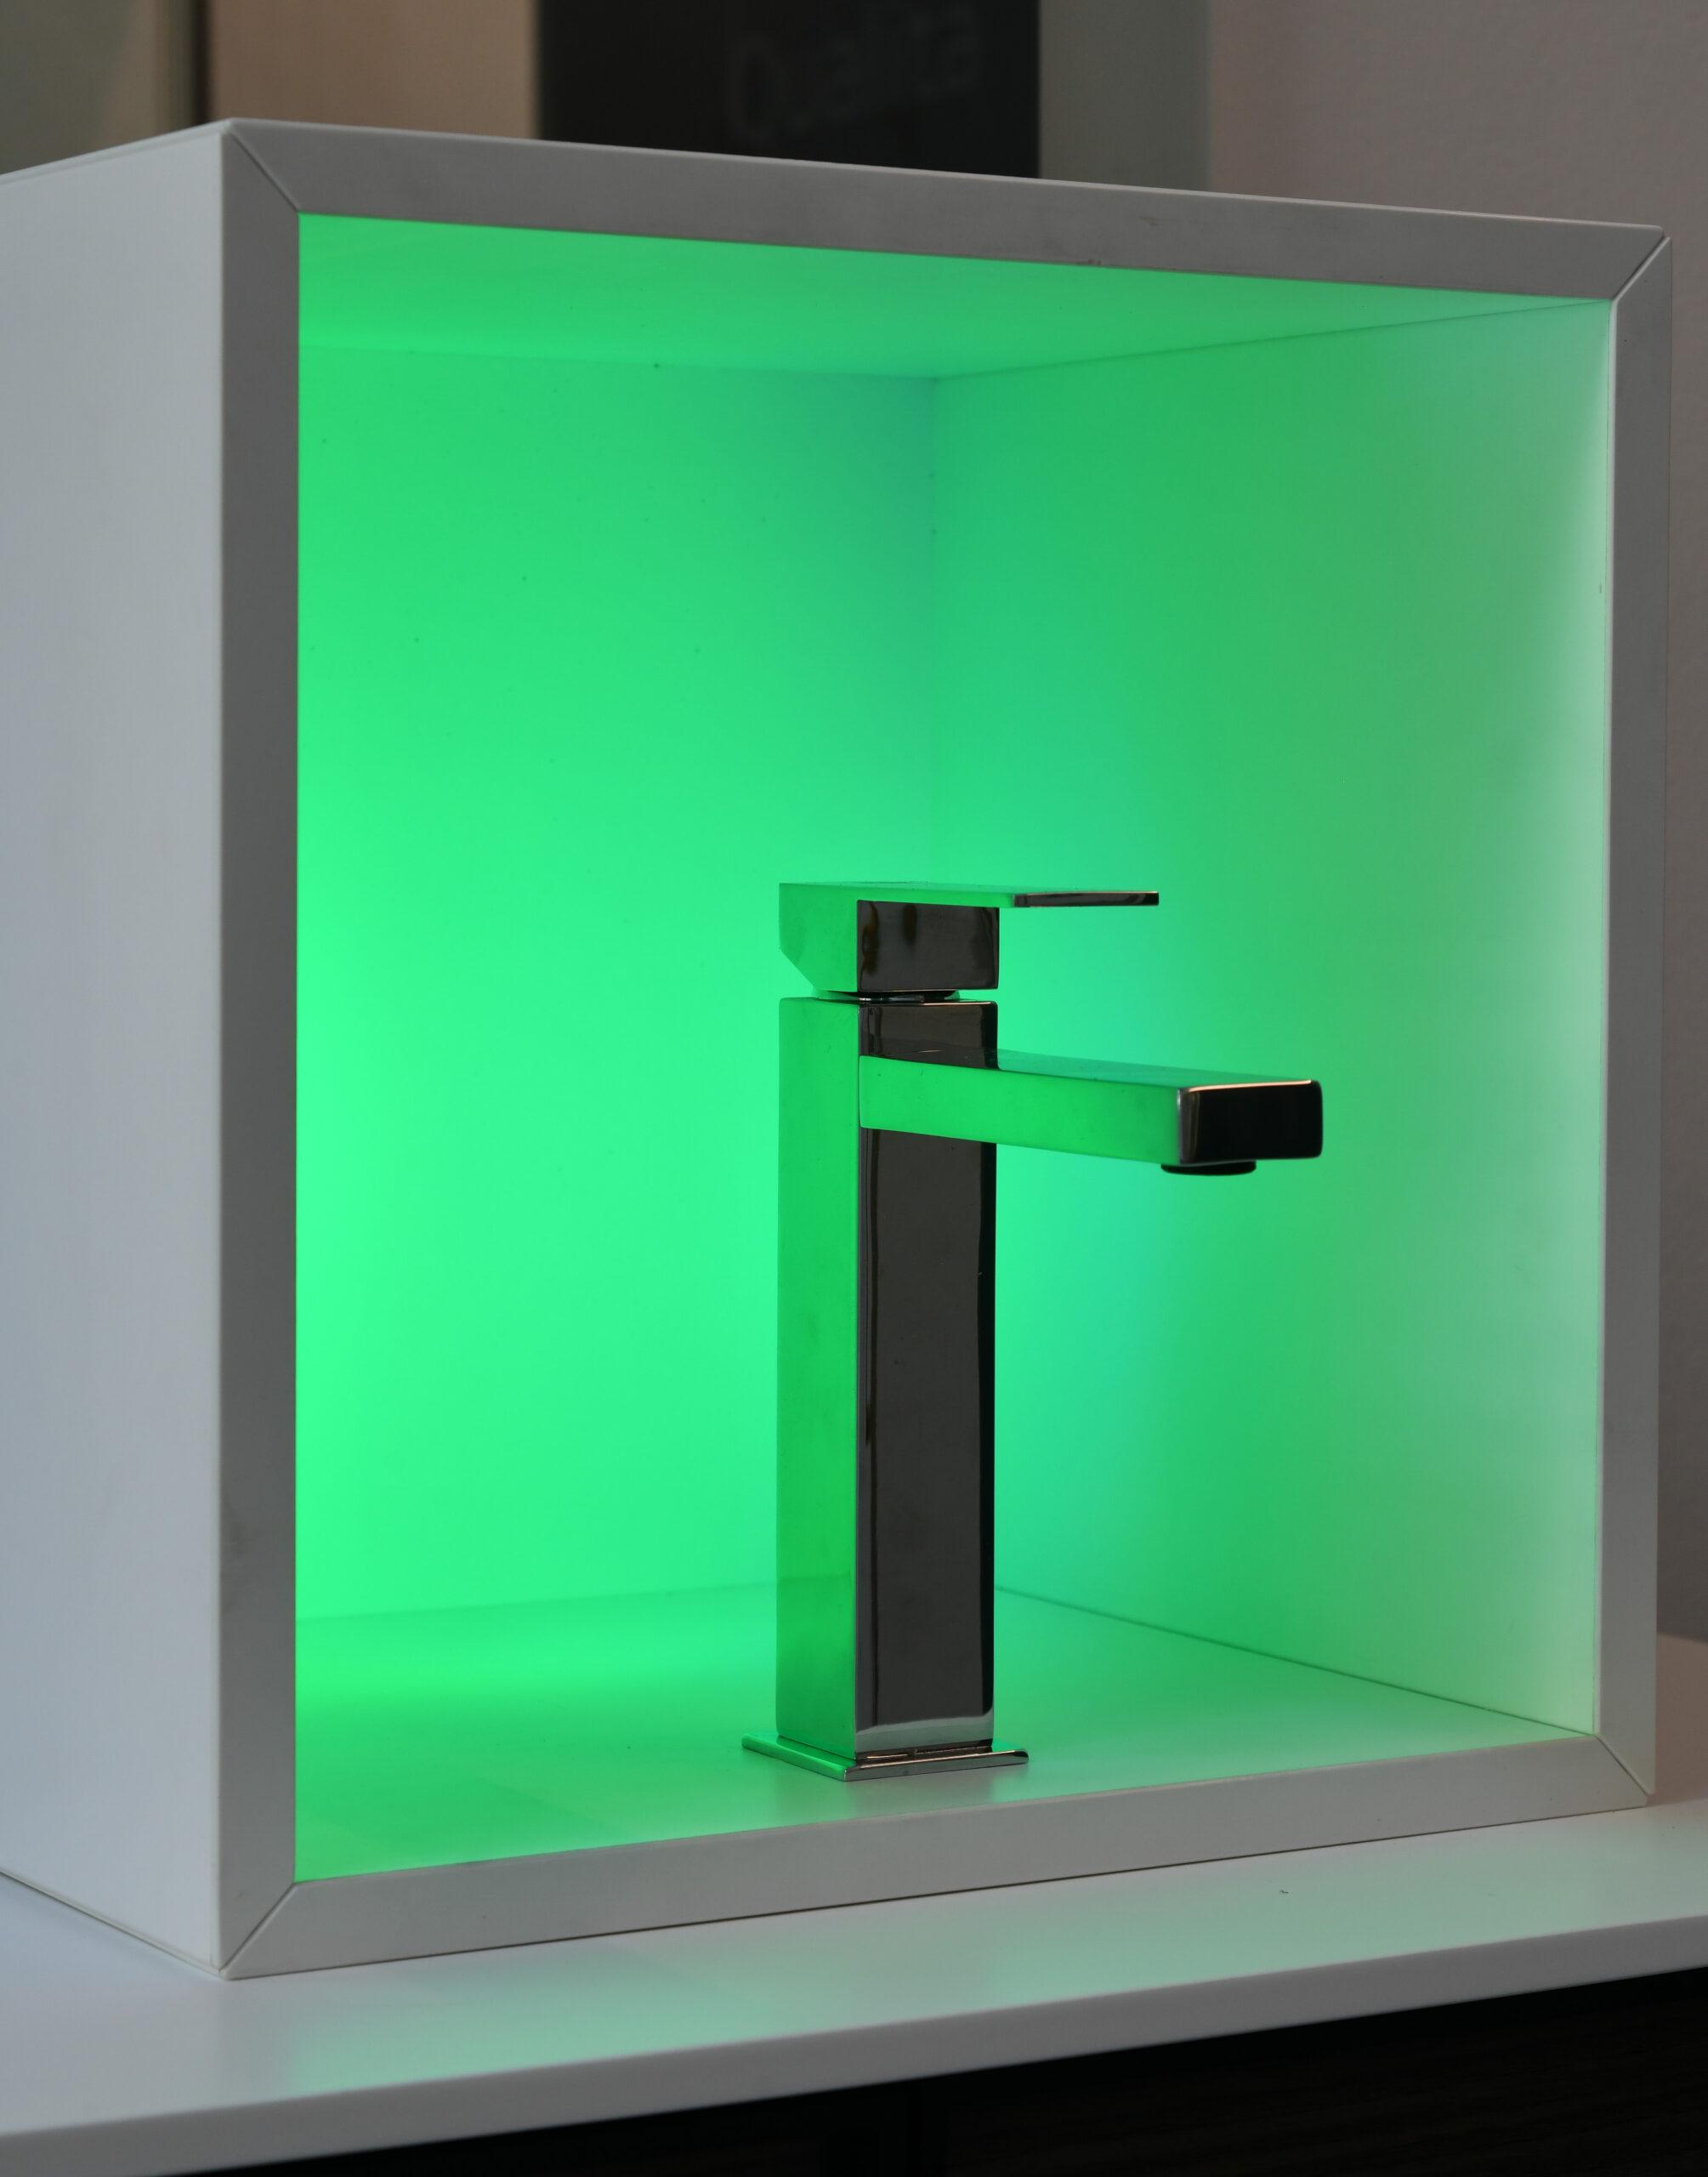 q-design sfondo verde